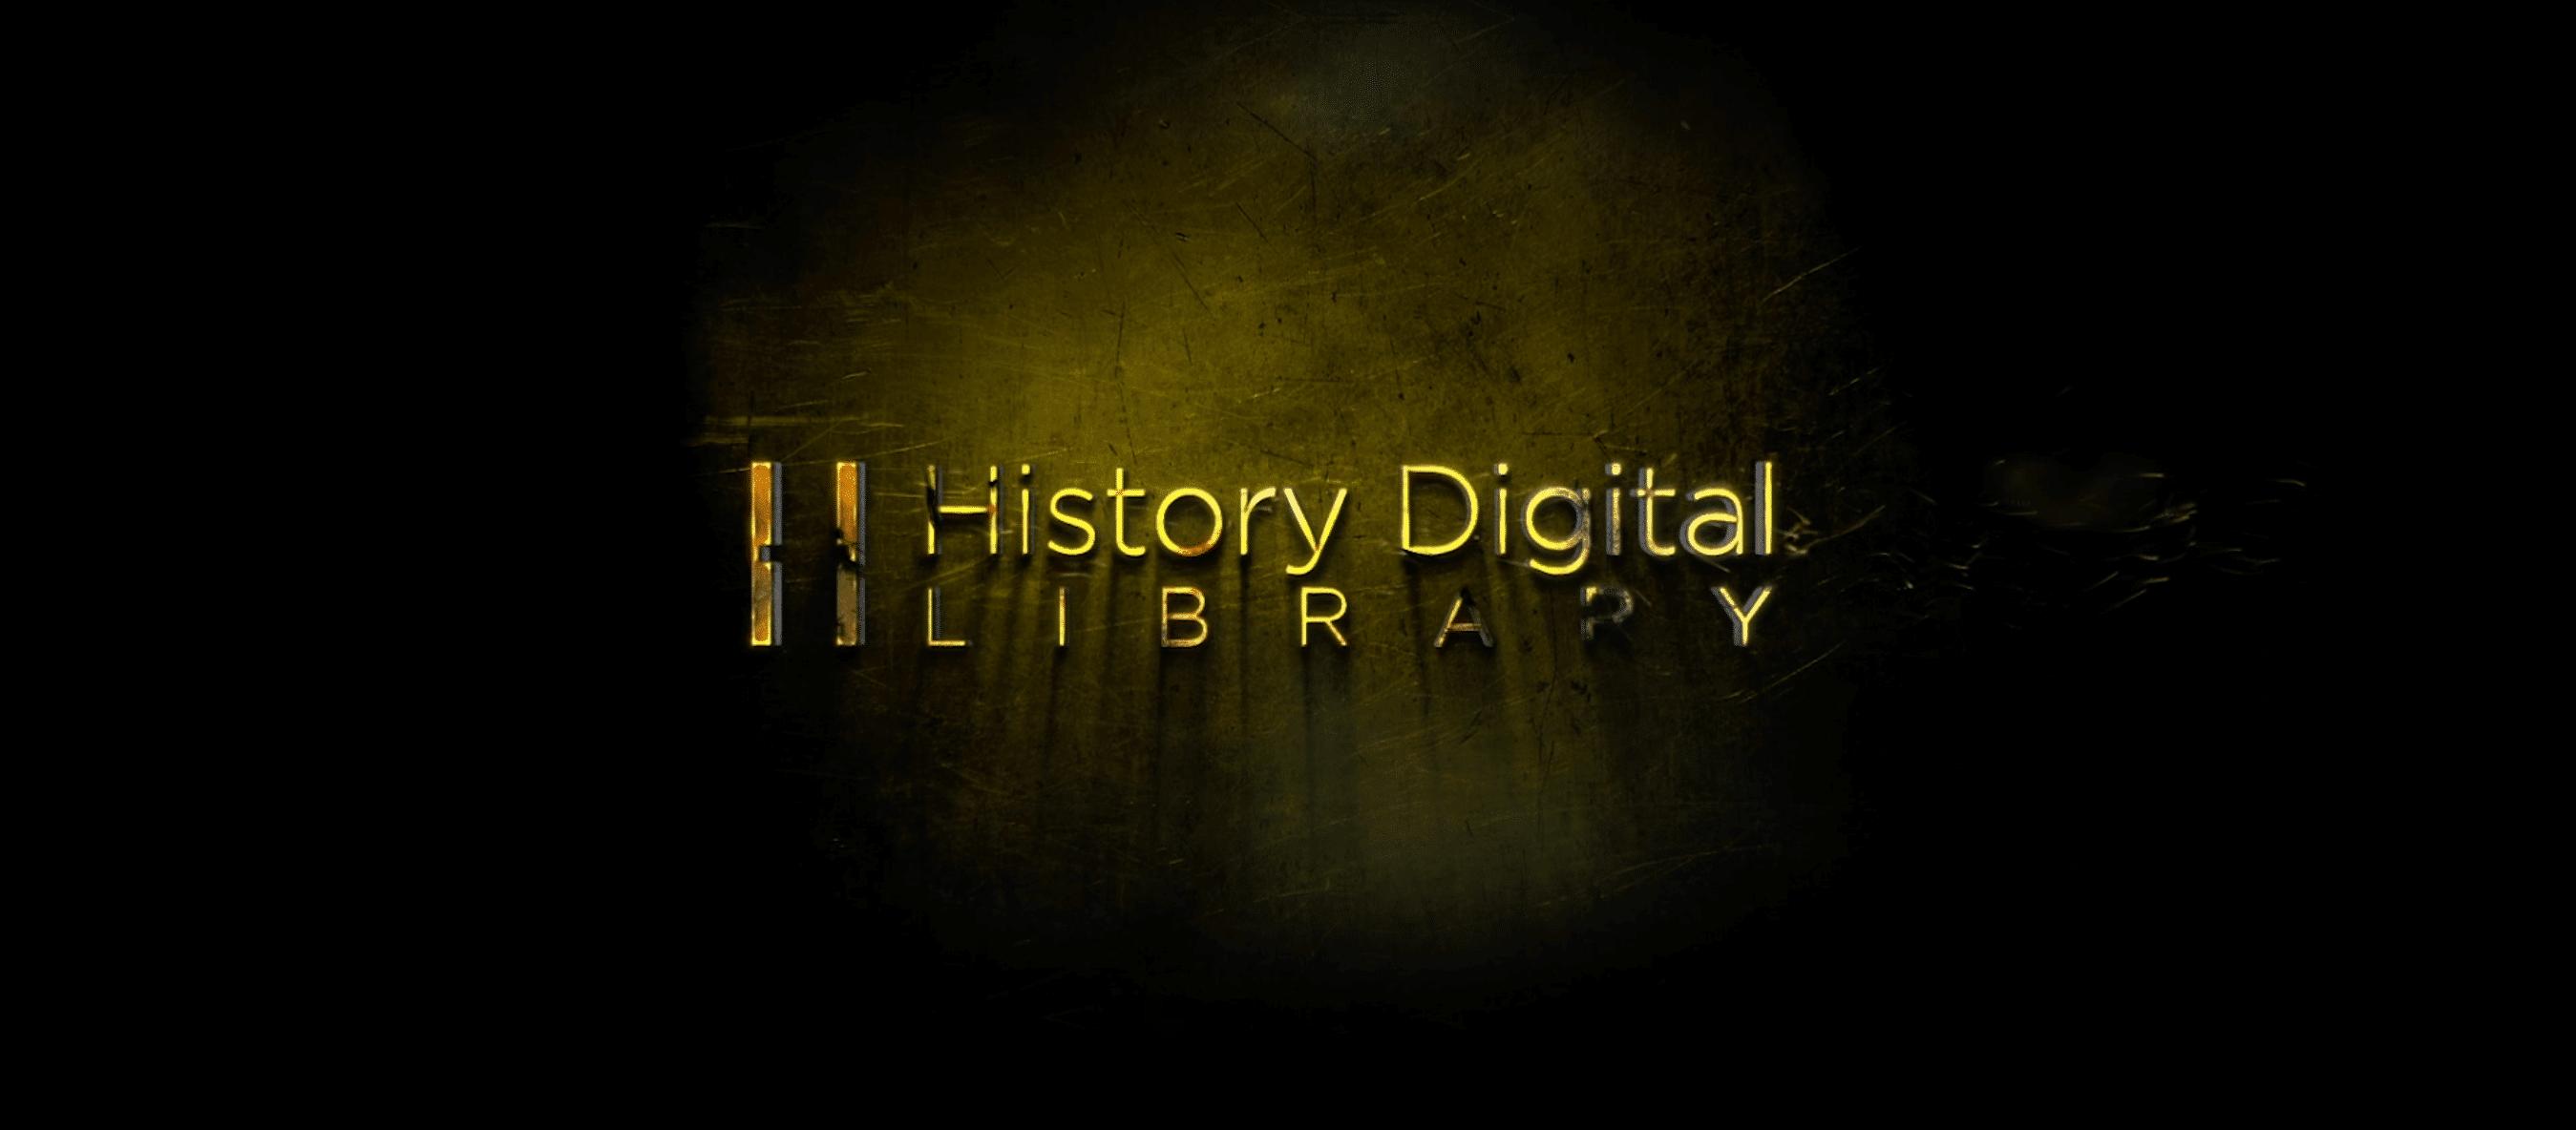 History Digital Library - La Biblioteca del futuro logo